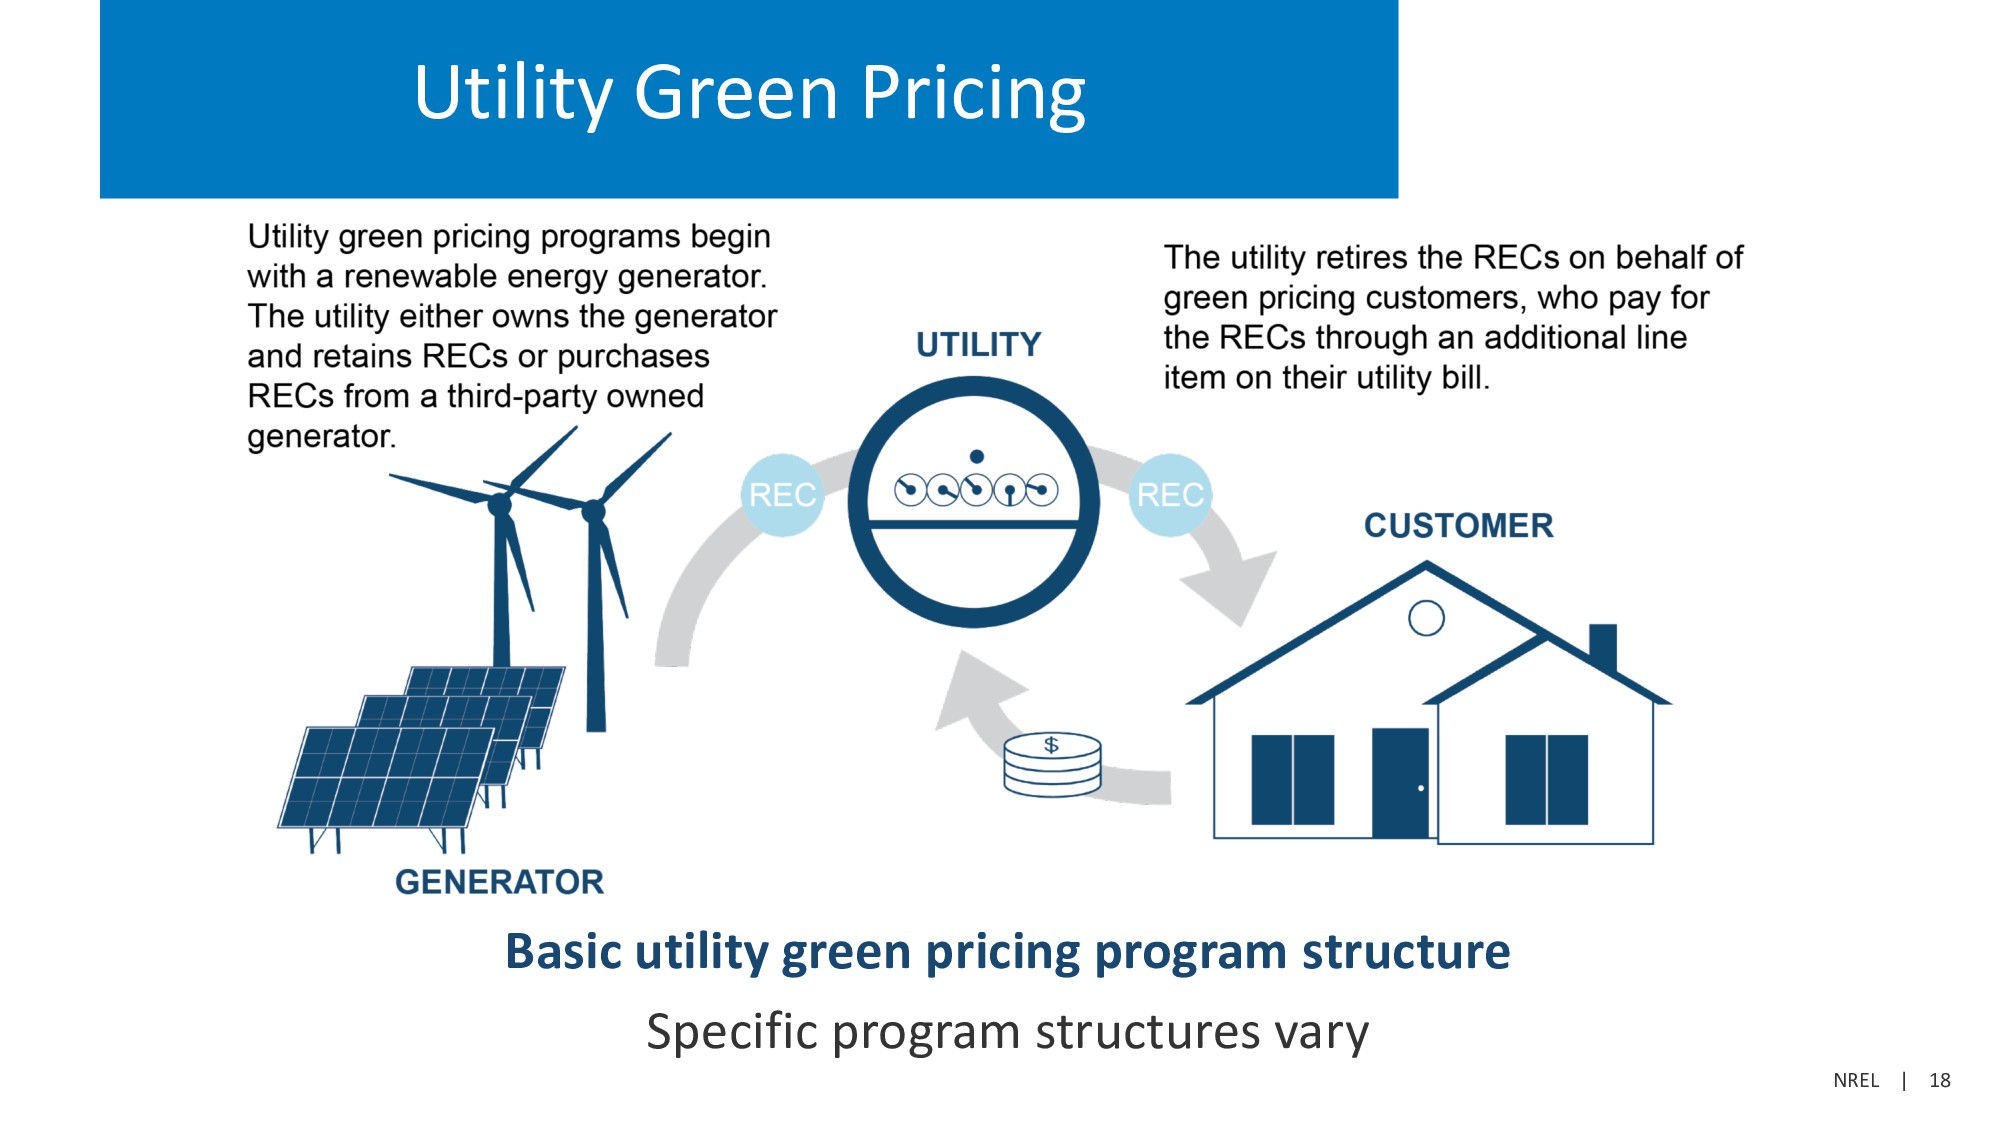 NREL   18 Utility Green Pricing Basic utility g...